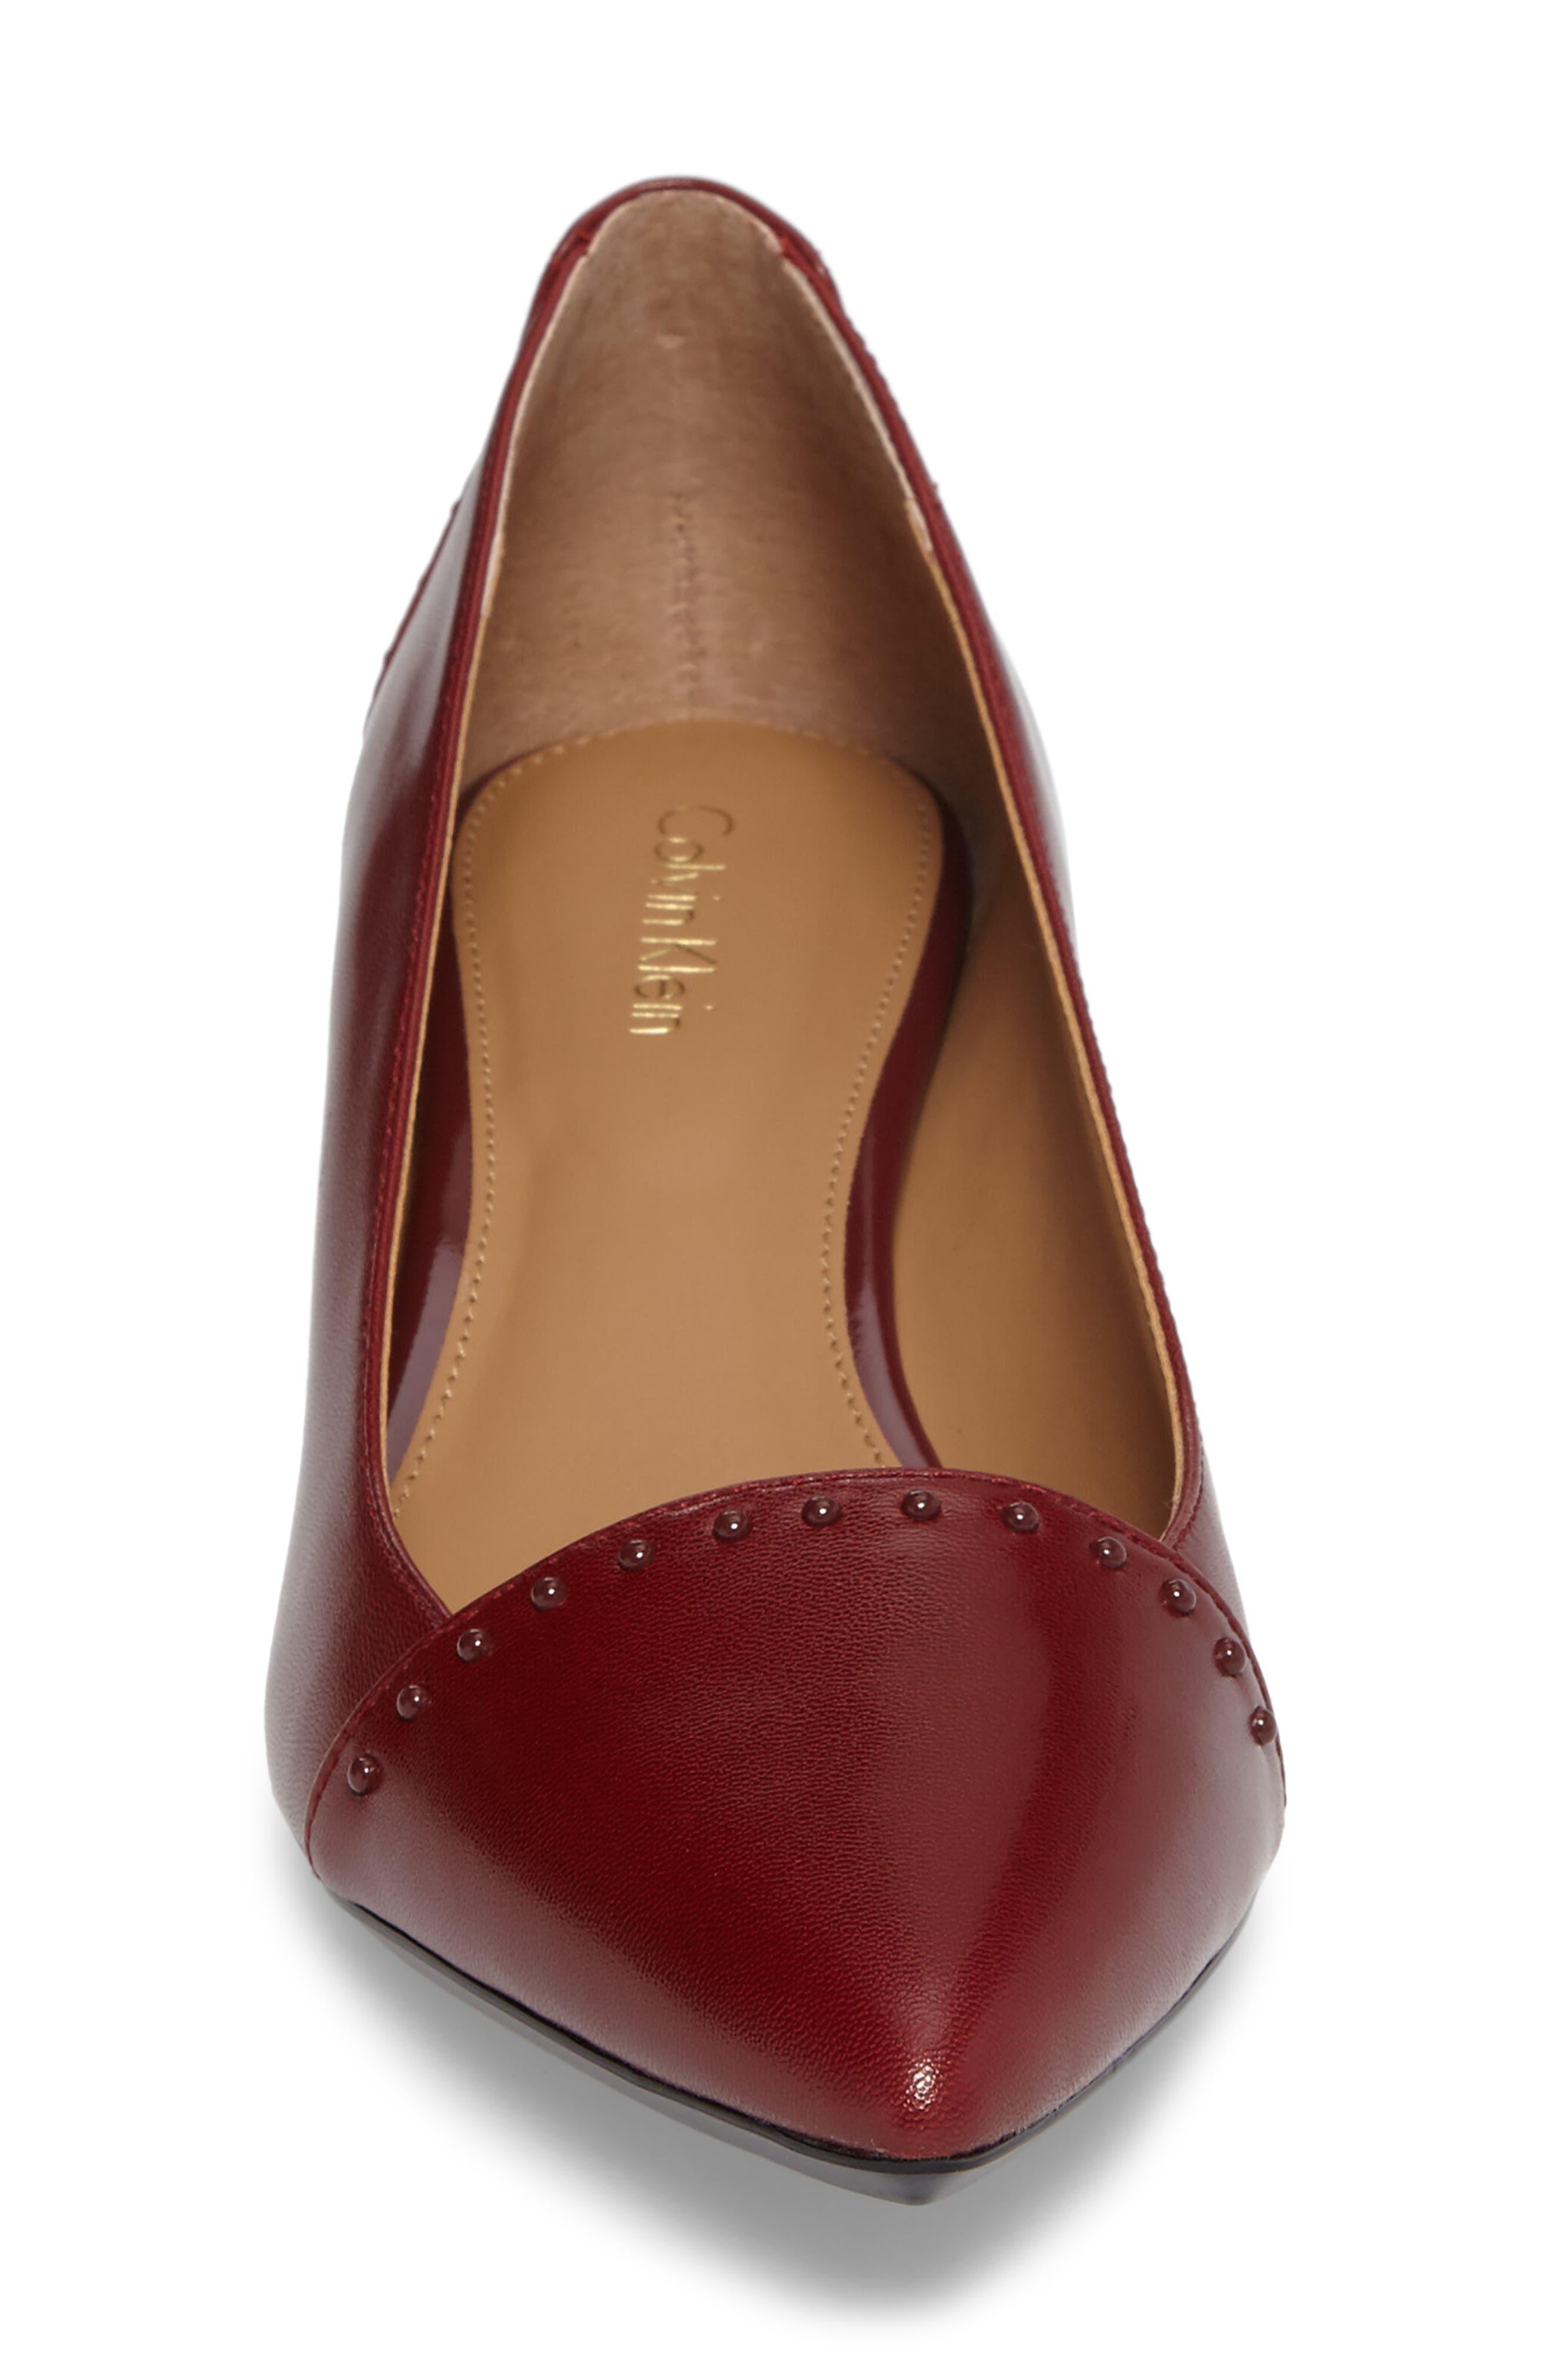 Griselda Studded Cap Toe Pump,                             Alternate thumbnail 4, color,                             Cherry Red